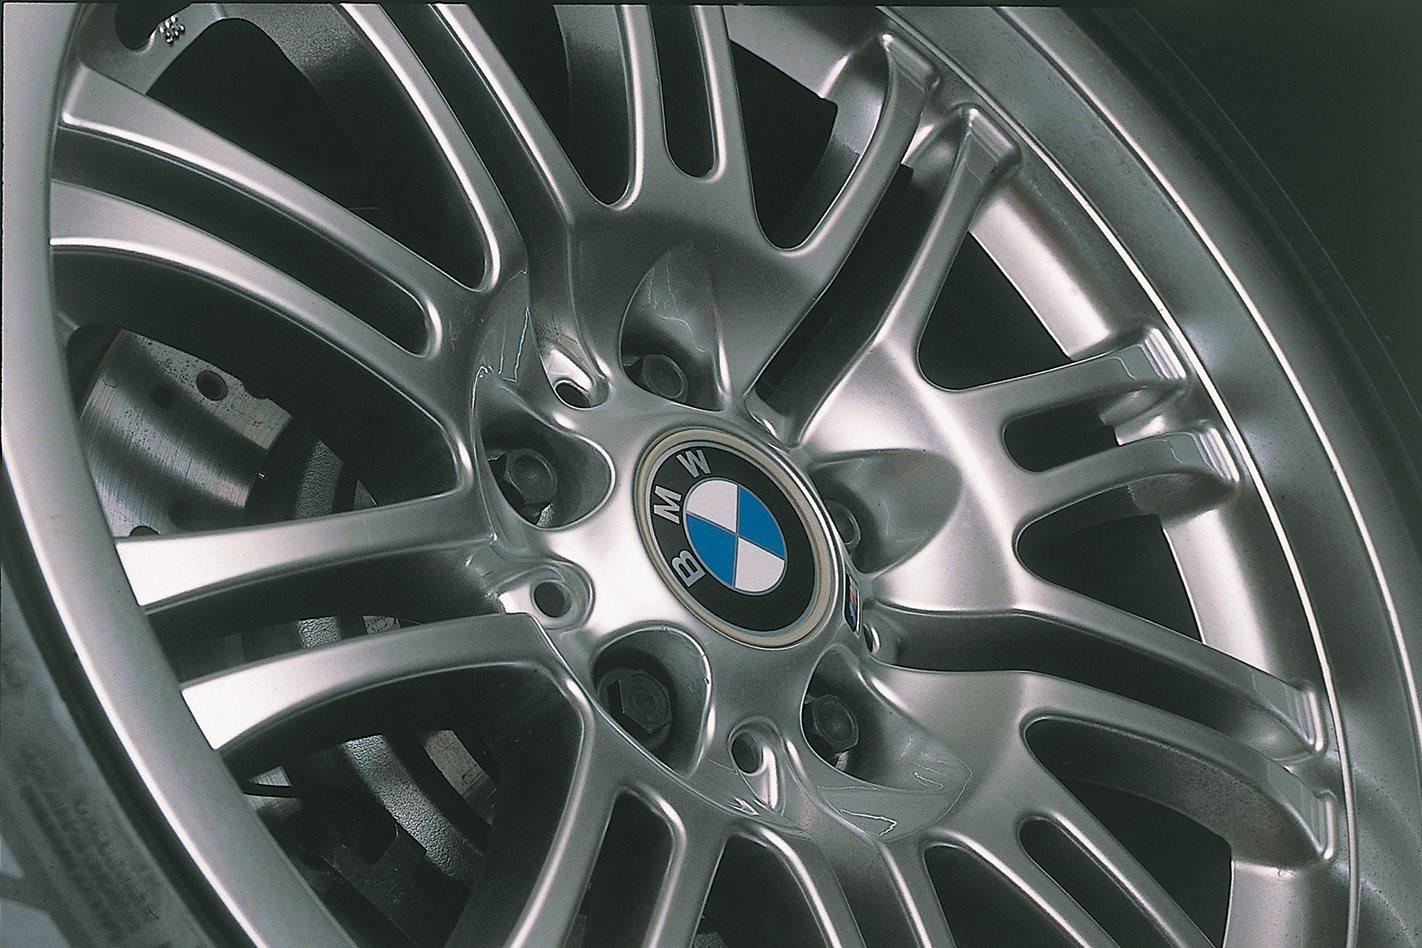 2002-BMW-E46-M3-HUBCAP.jpg